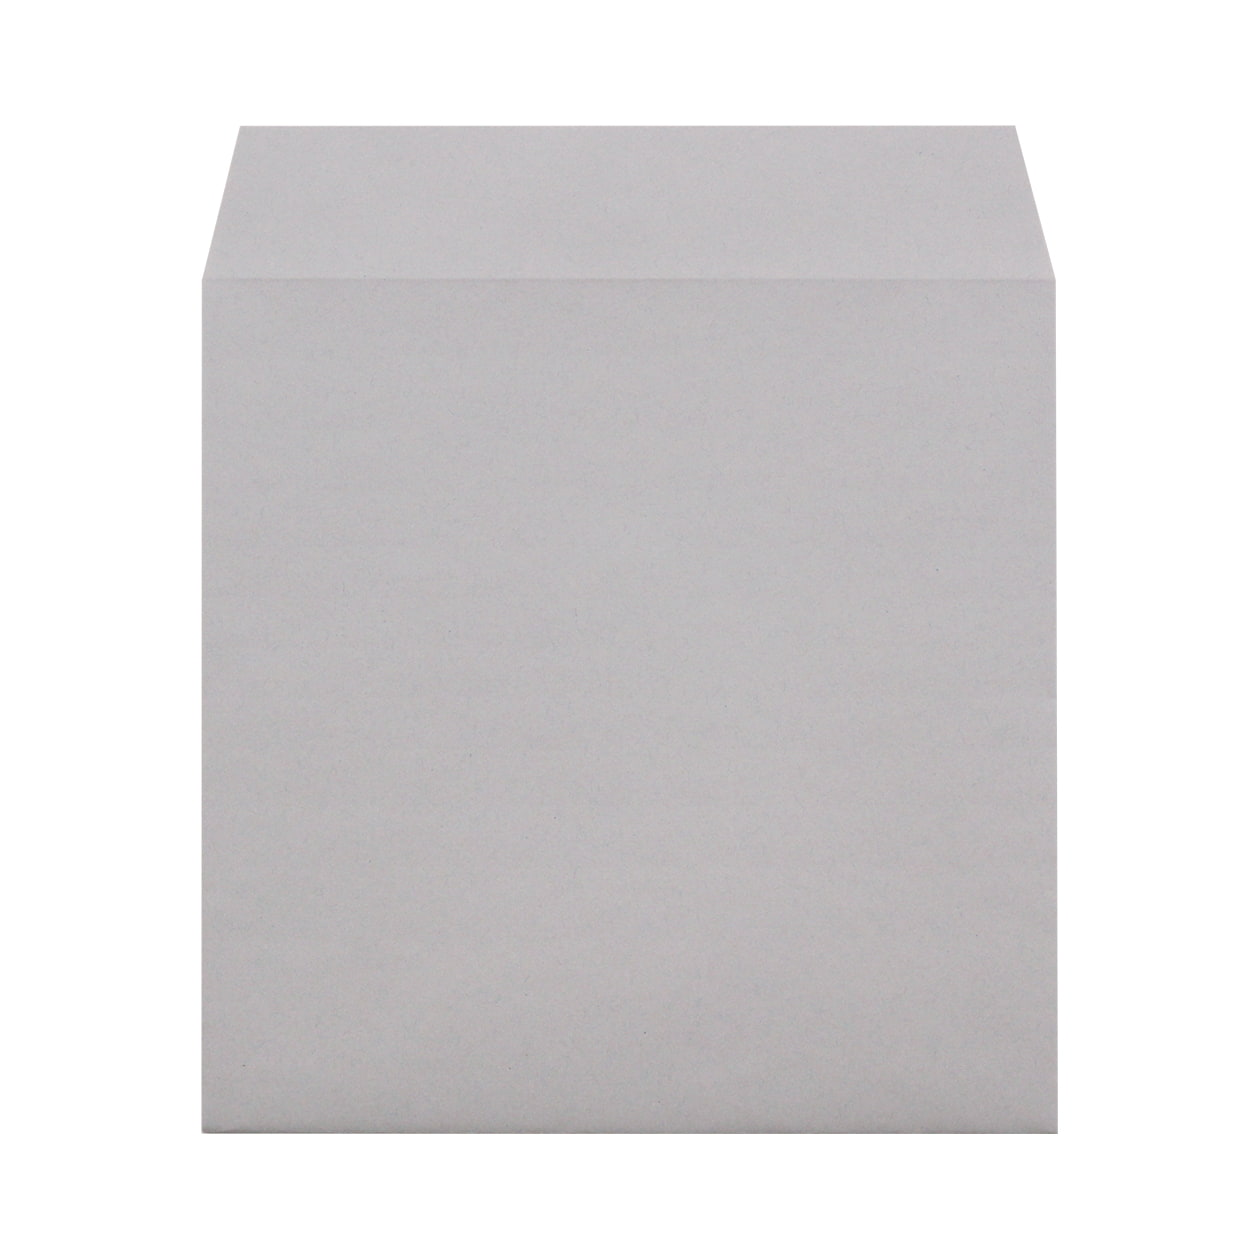 SE22封筒 HAGURUMA Basic ライナーグレイ 100g